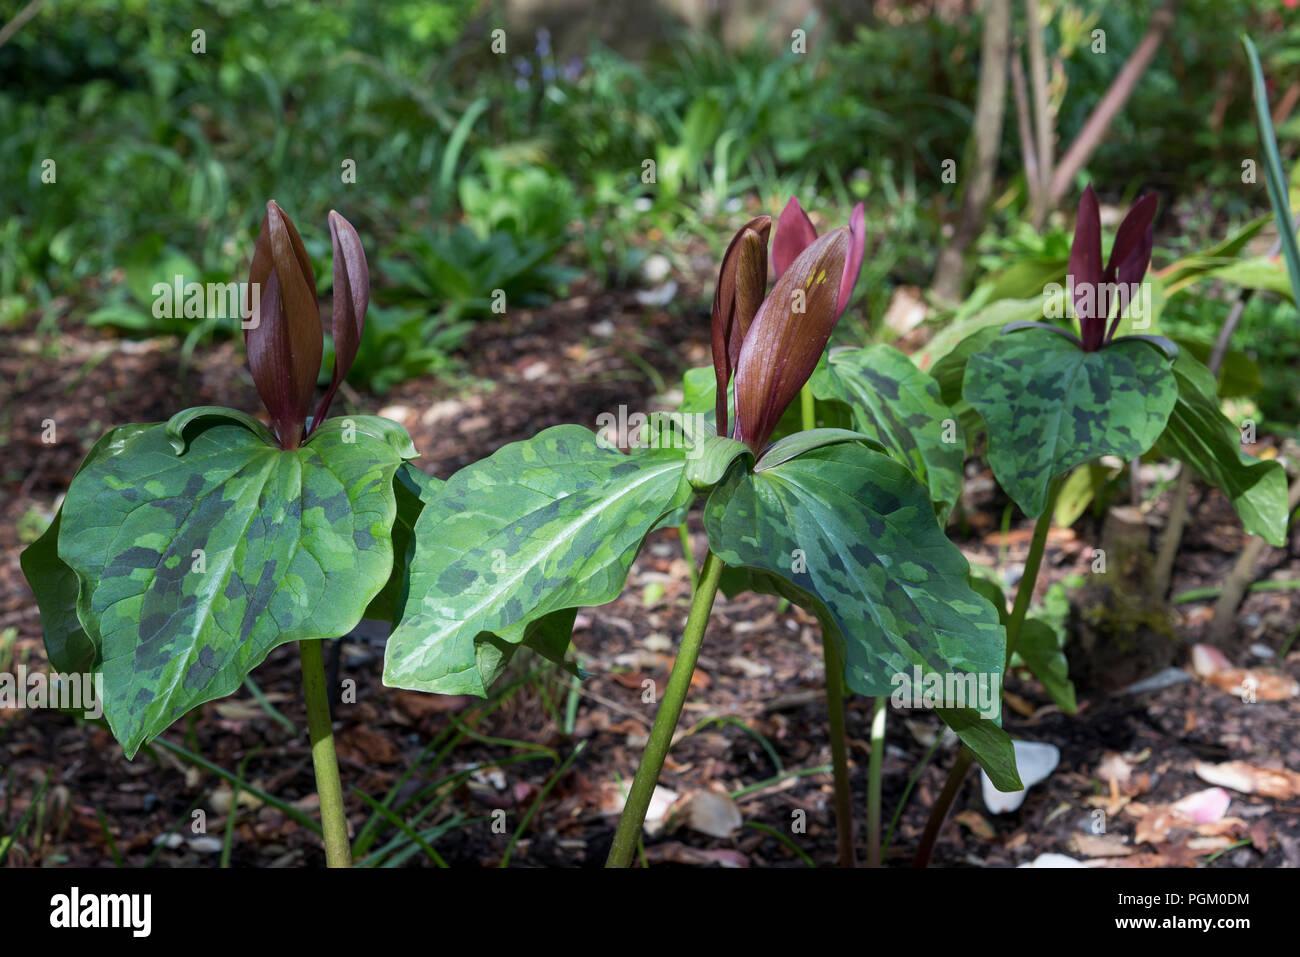 Trillium chloropetalum var giganteum a spring flowering shade trillium chloropetalum var giganteum a spring flowering shade loving perennial plant mightylinksfo